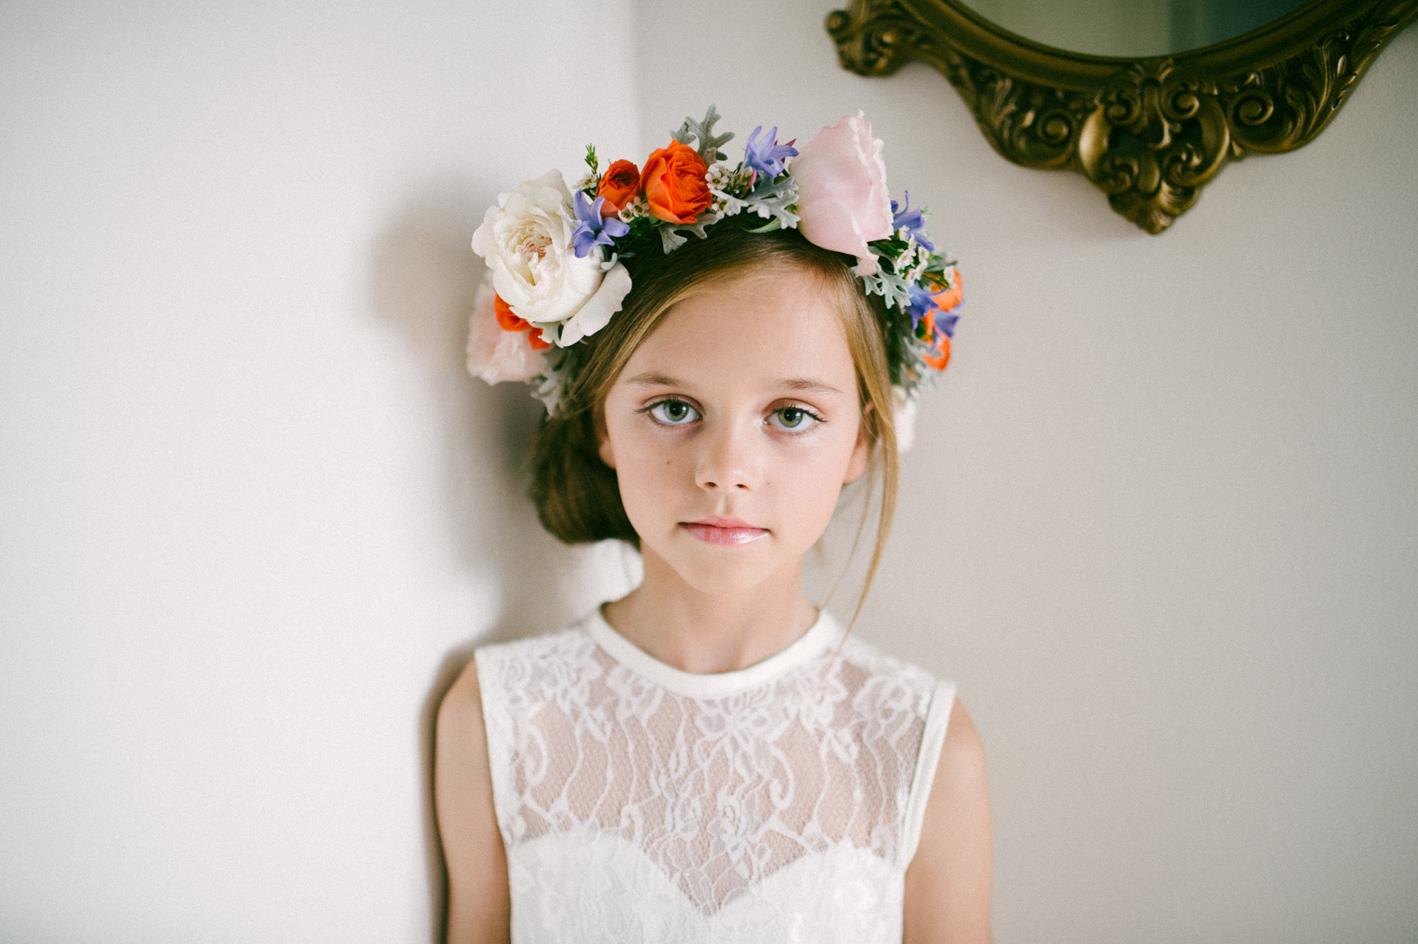 005-crown-of-eden-sophie-baker-photography